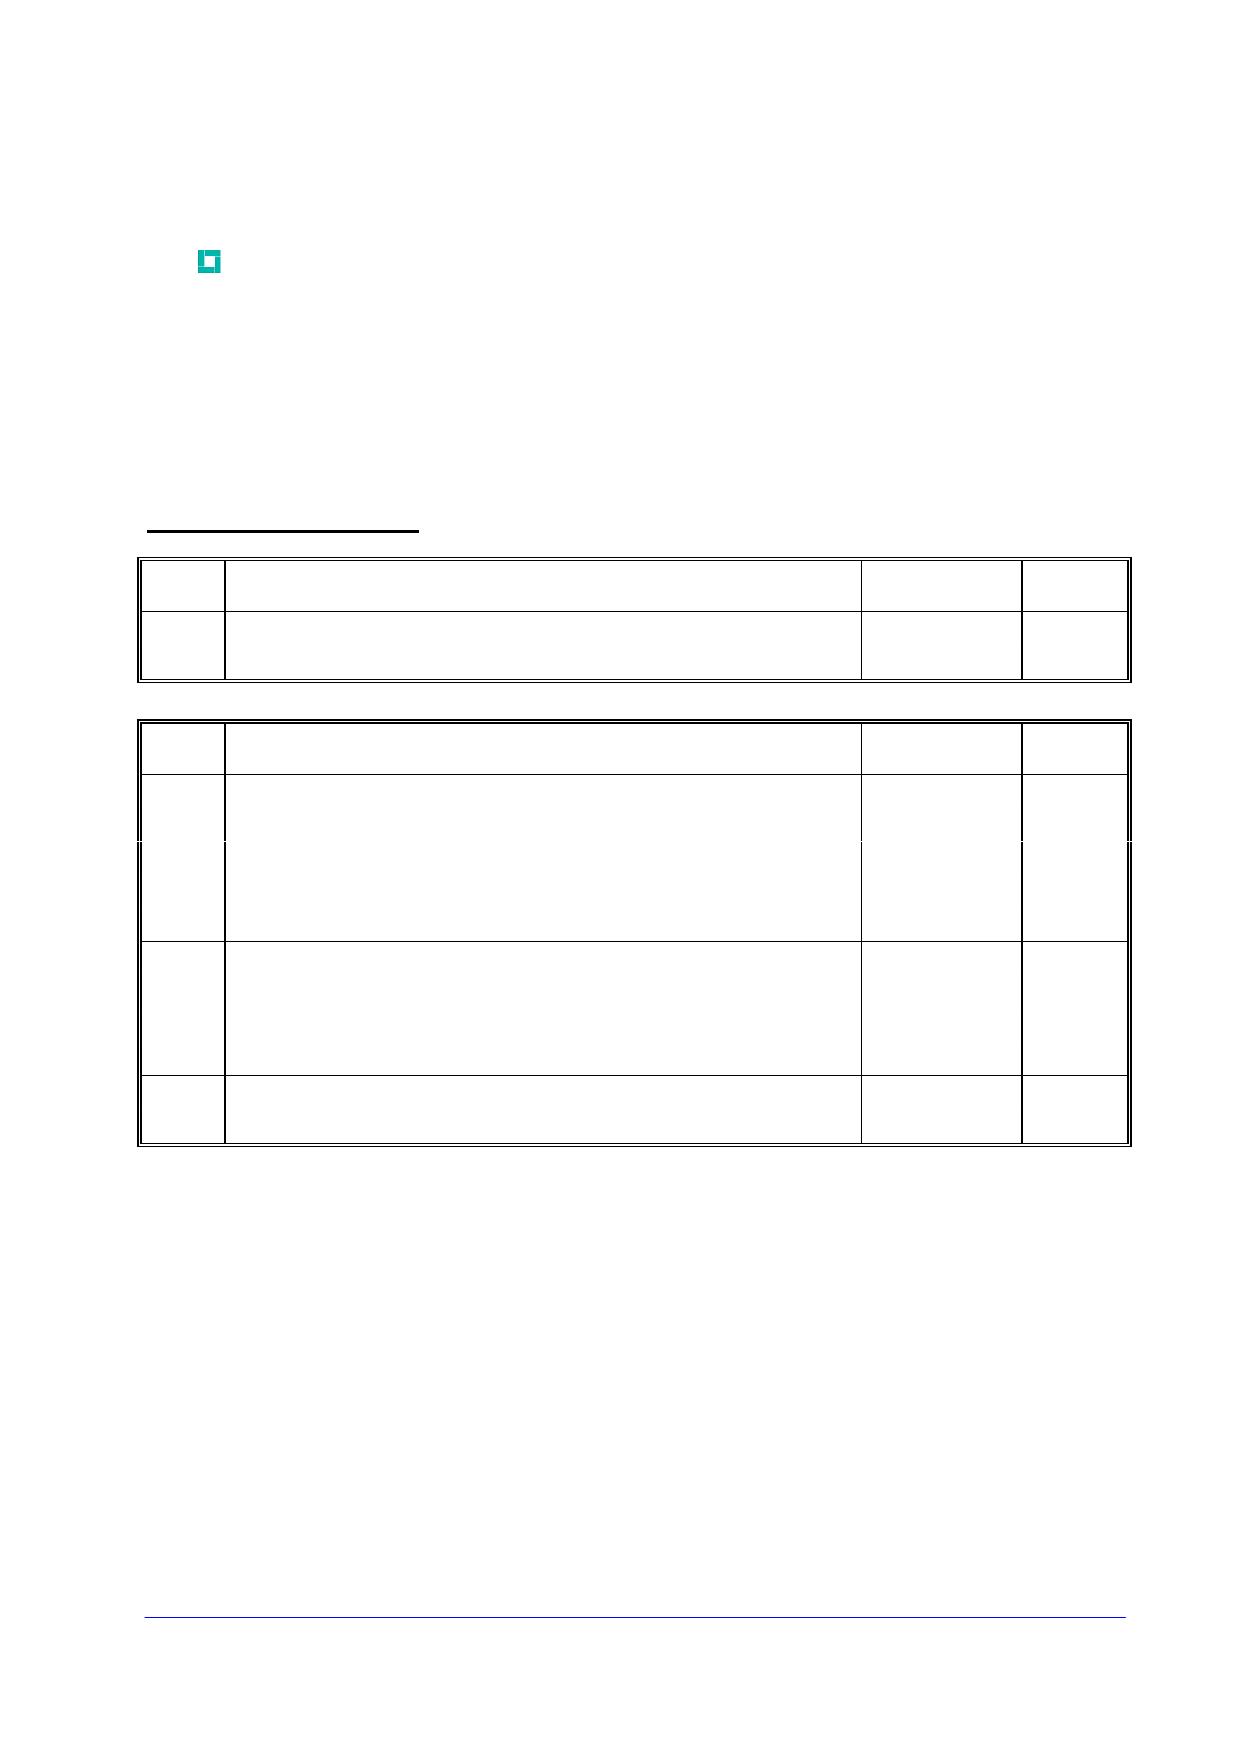 M0367WC220 دیتاشیت PDF